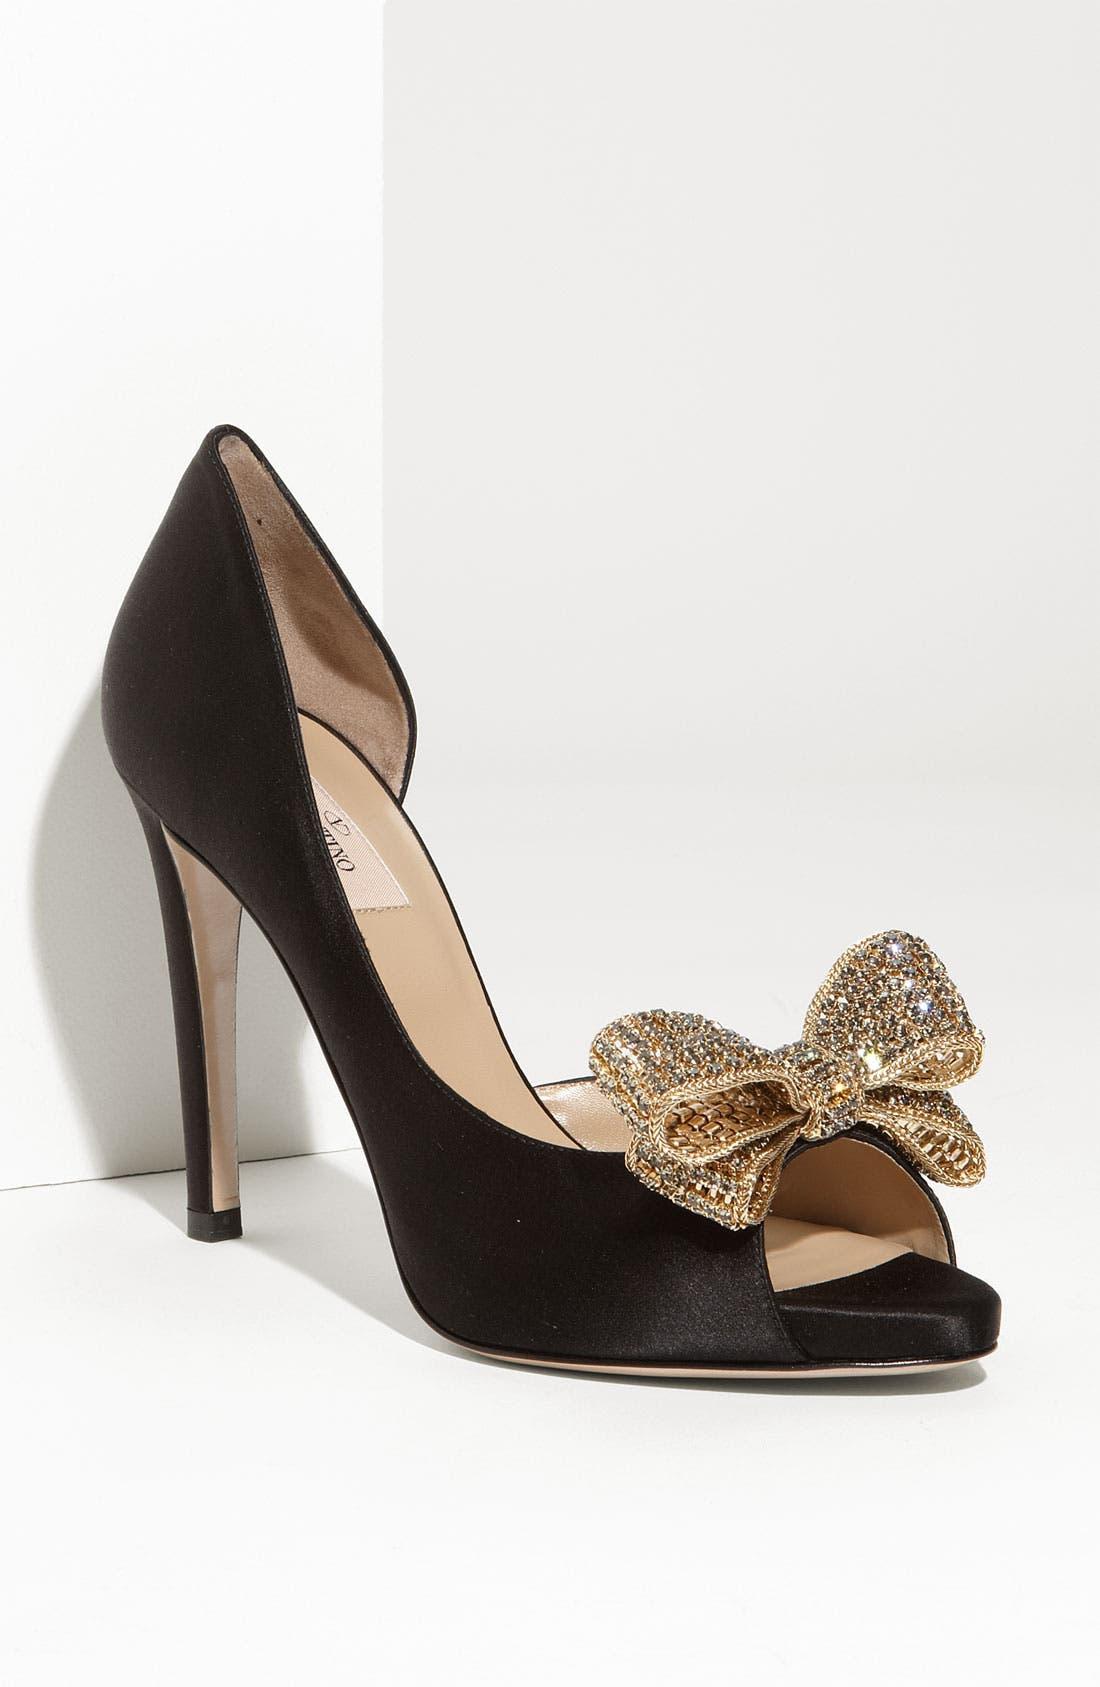 Main Image - VALENTINO GARAVANI Jewelry Couture Bow d'Orsay Pump